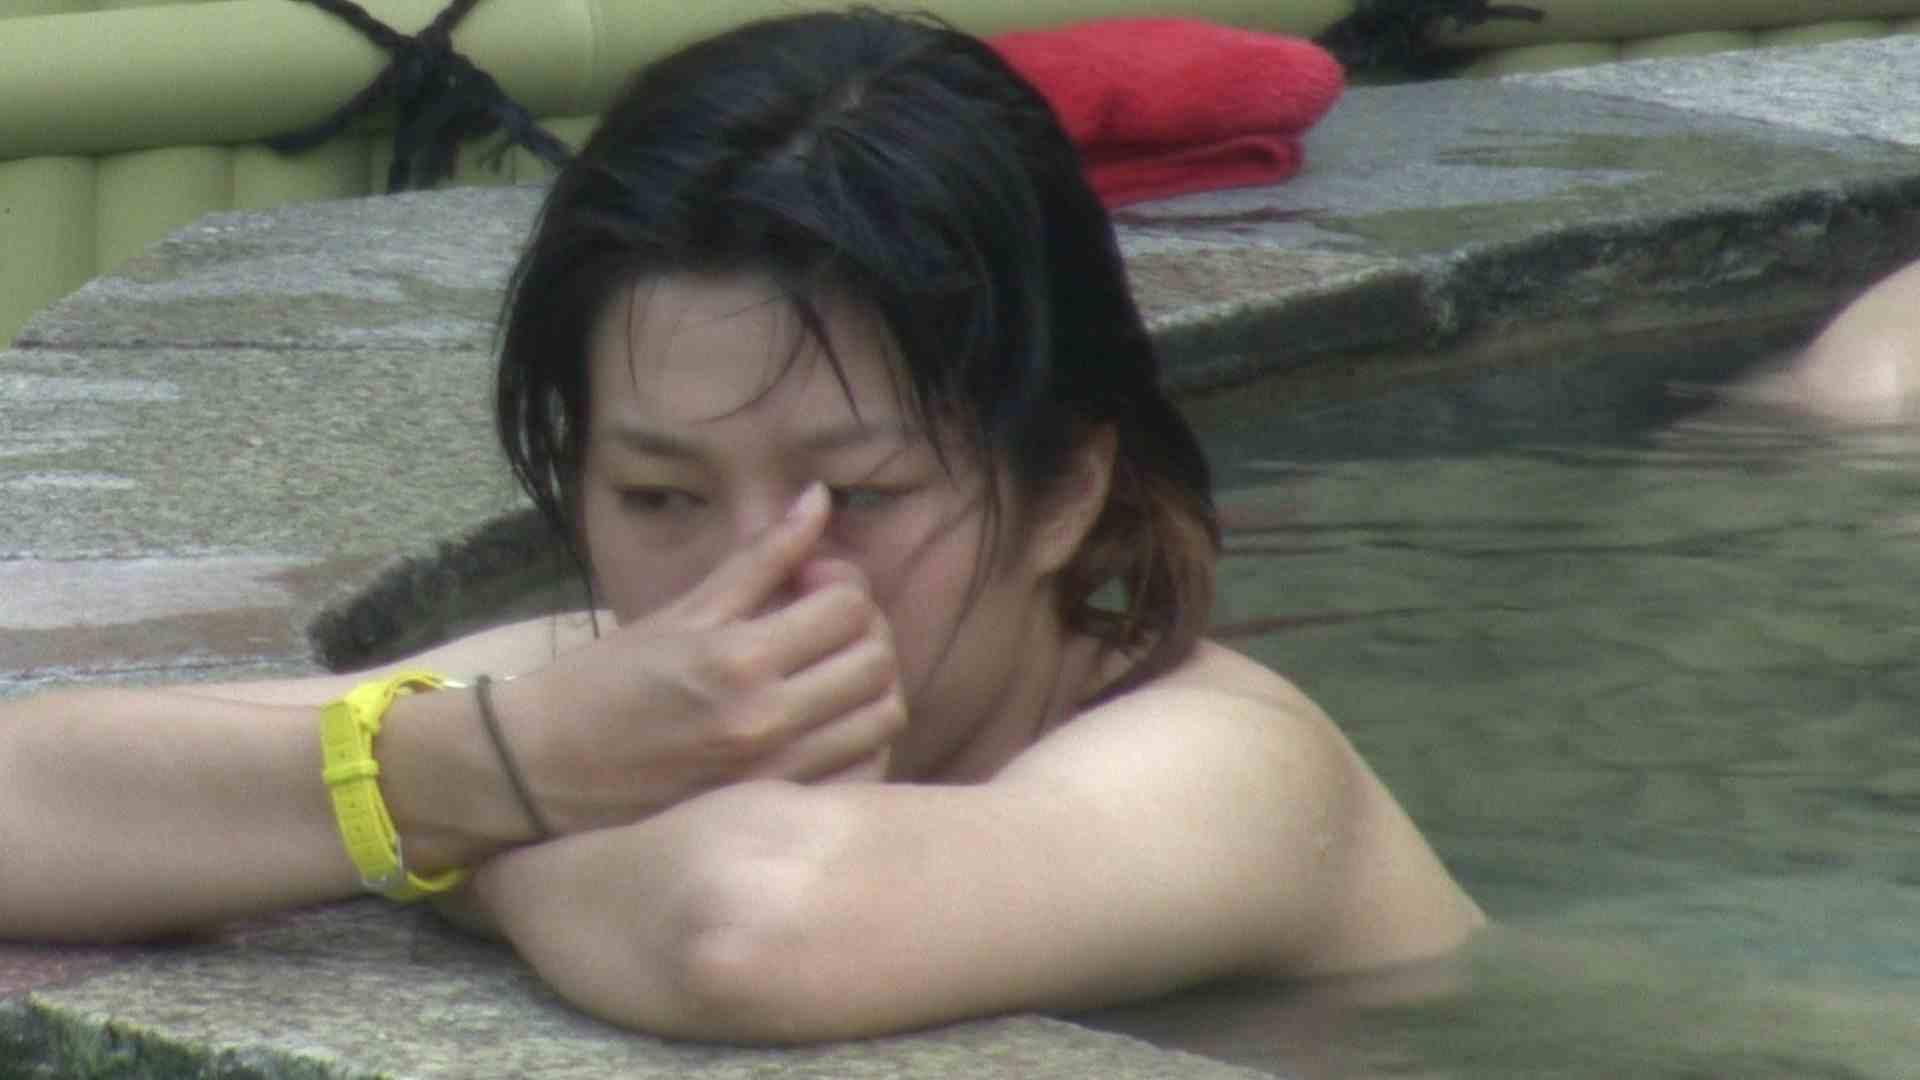 Aquaな露天風呂Vol.132 0 | 0  61連発 37